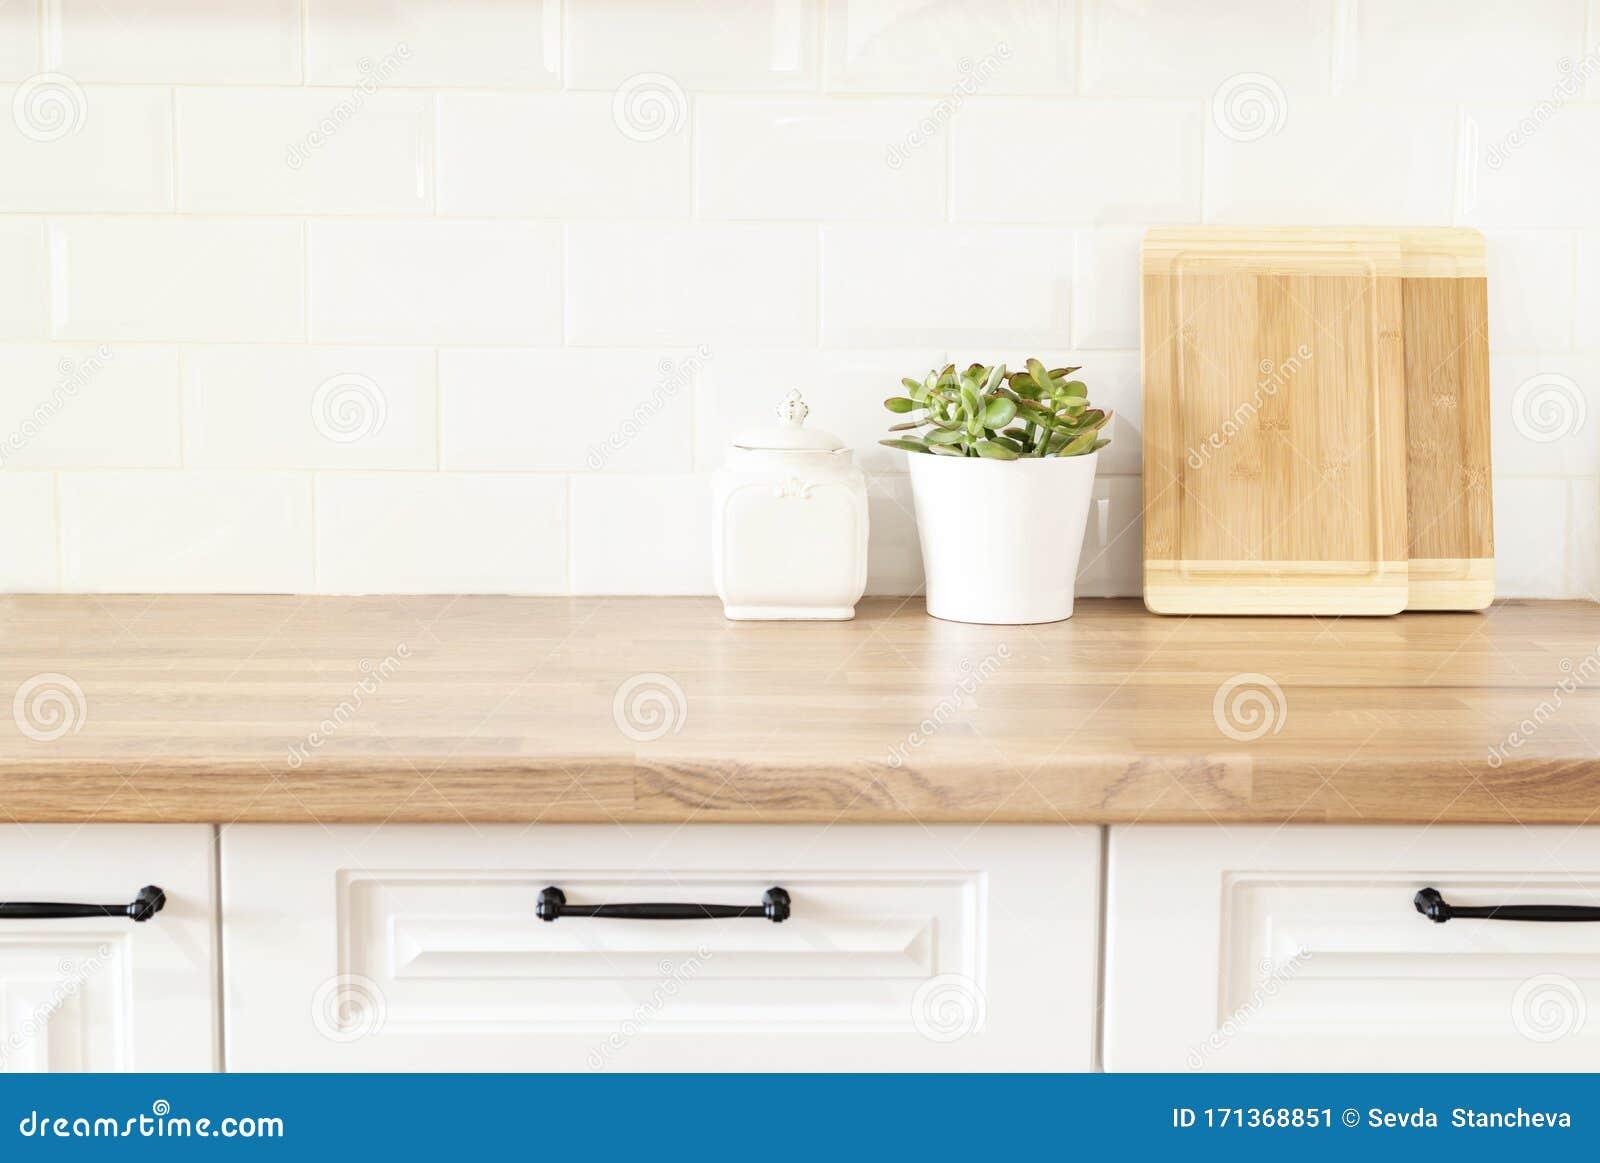 Coastal Kitchen Interior Design Photos Free Royalty Free Stock Photos From Dreamstime